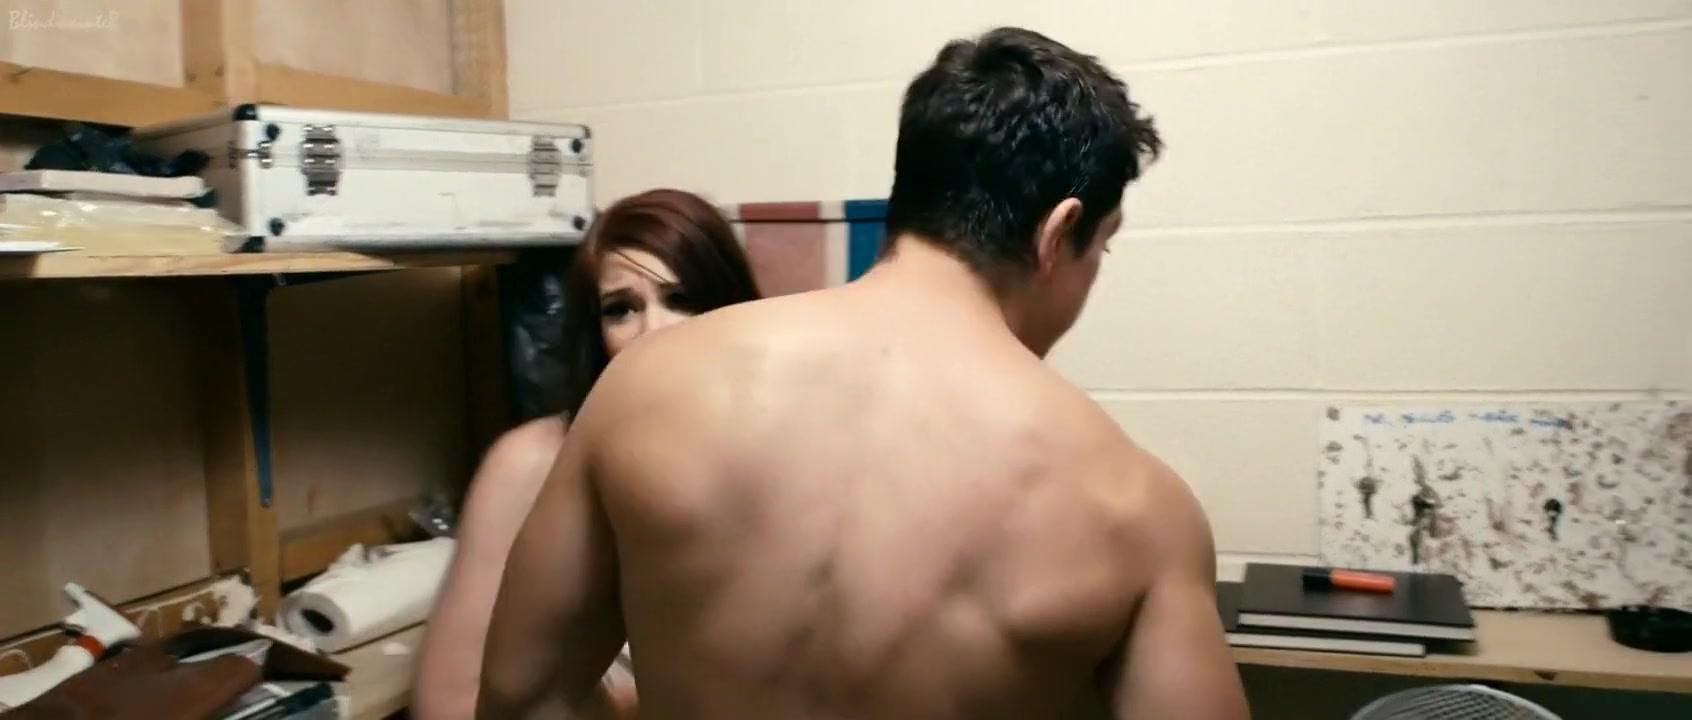 Spanish porn star tattoo Quality porn